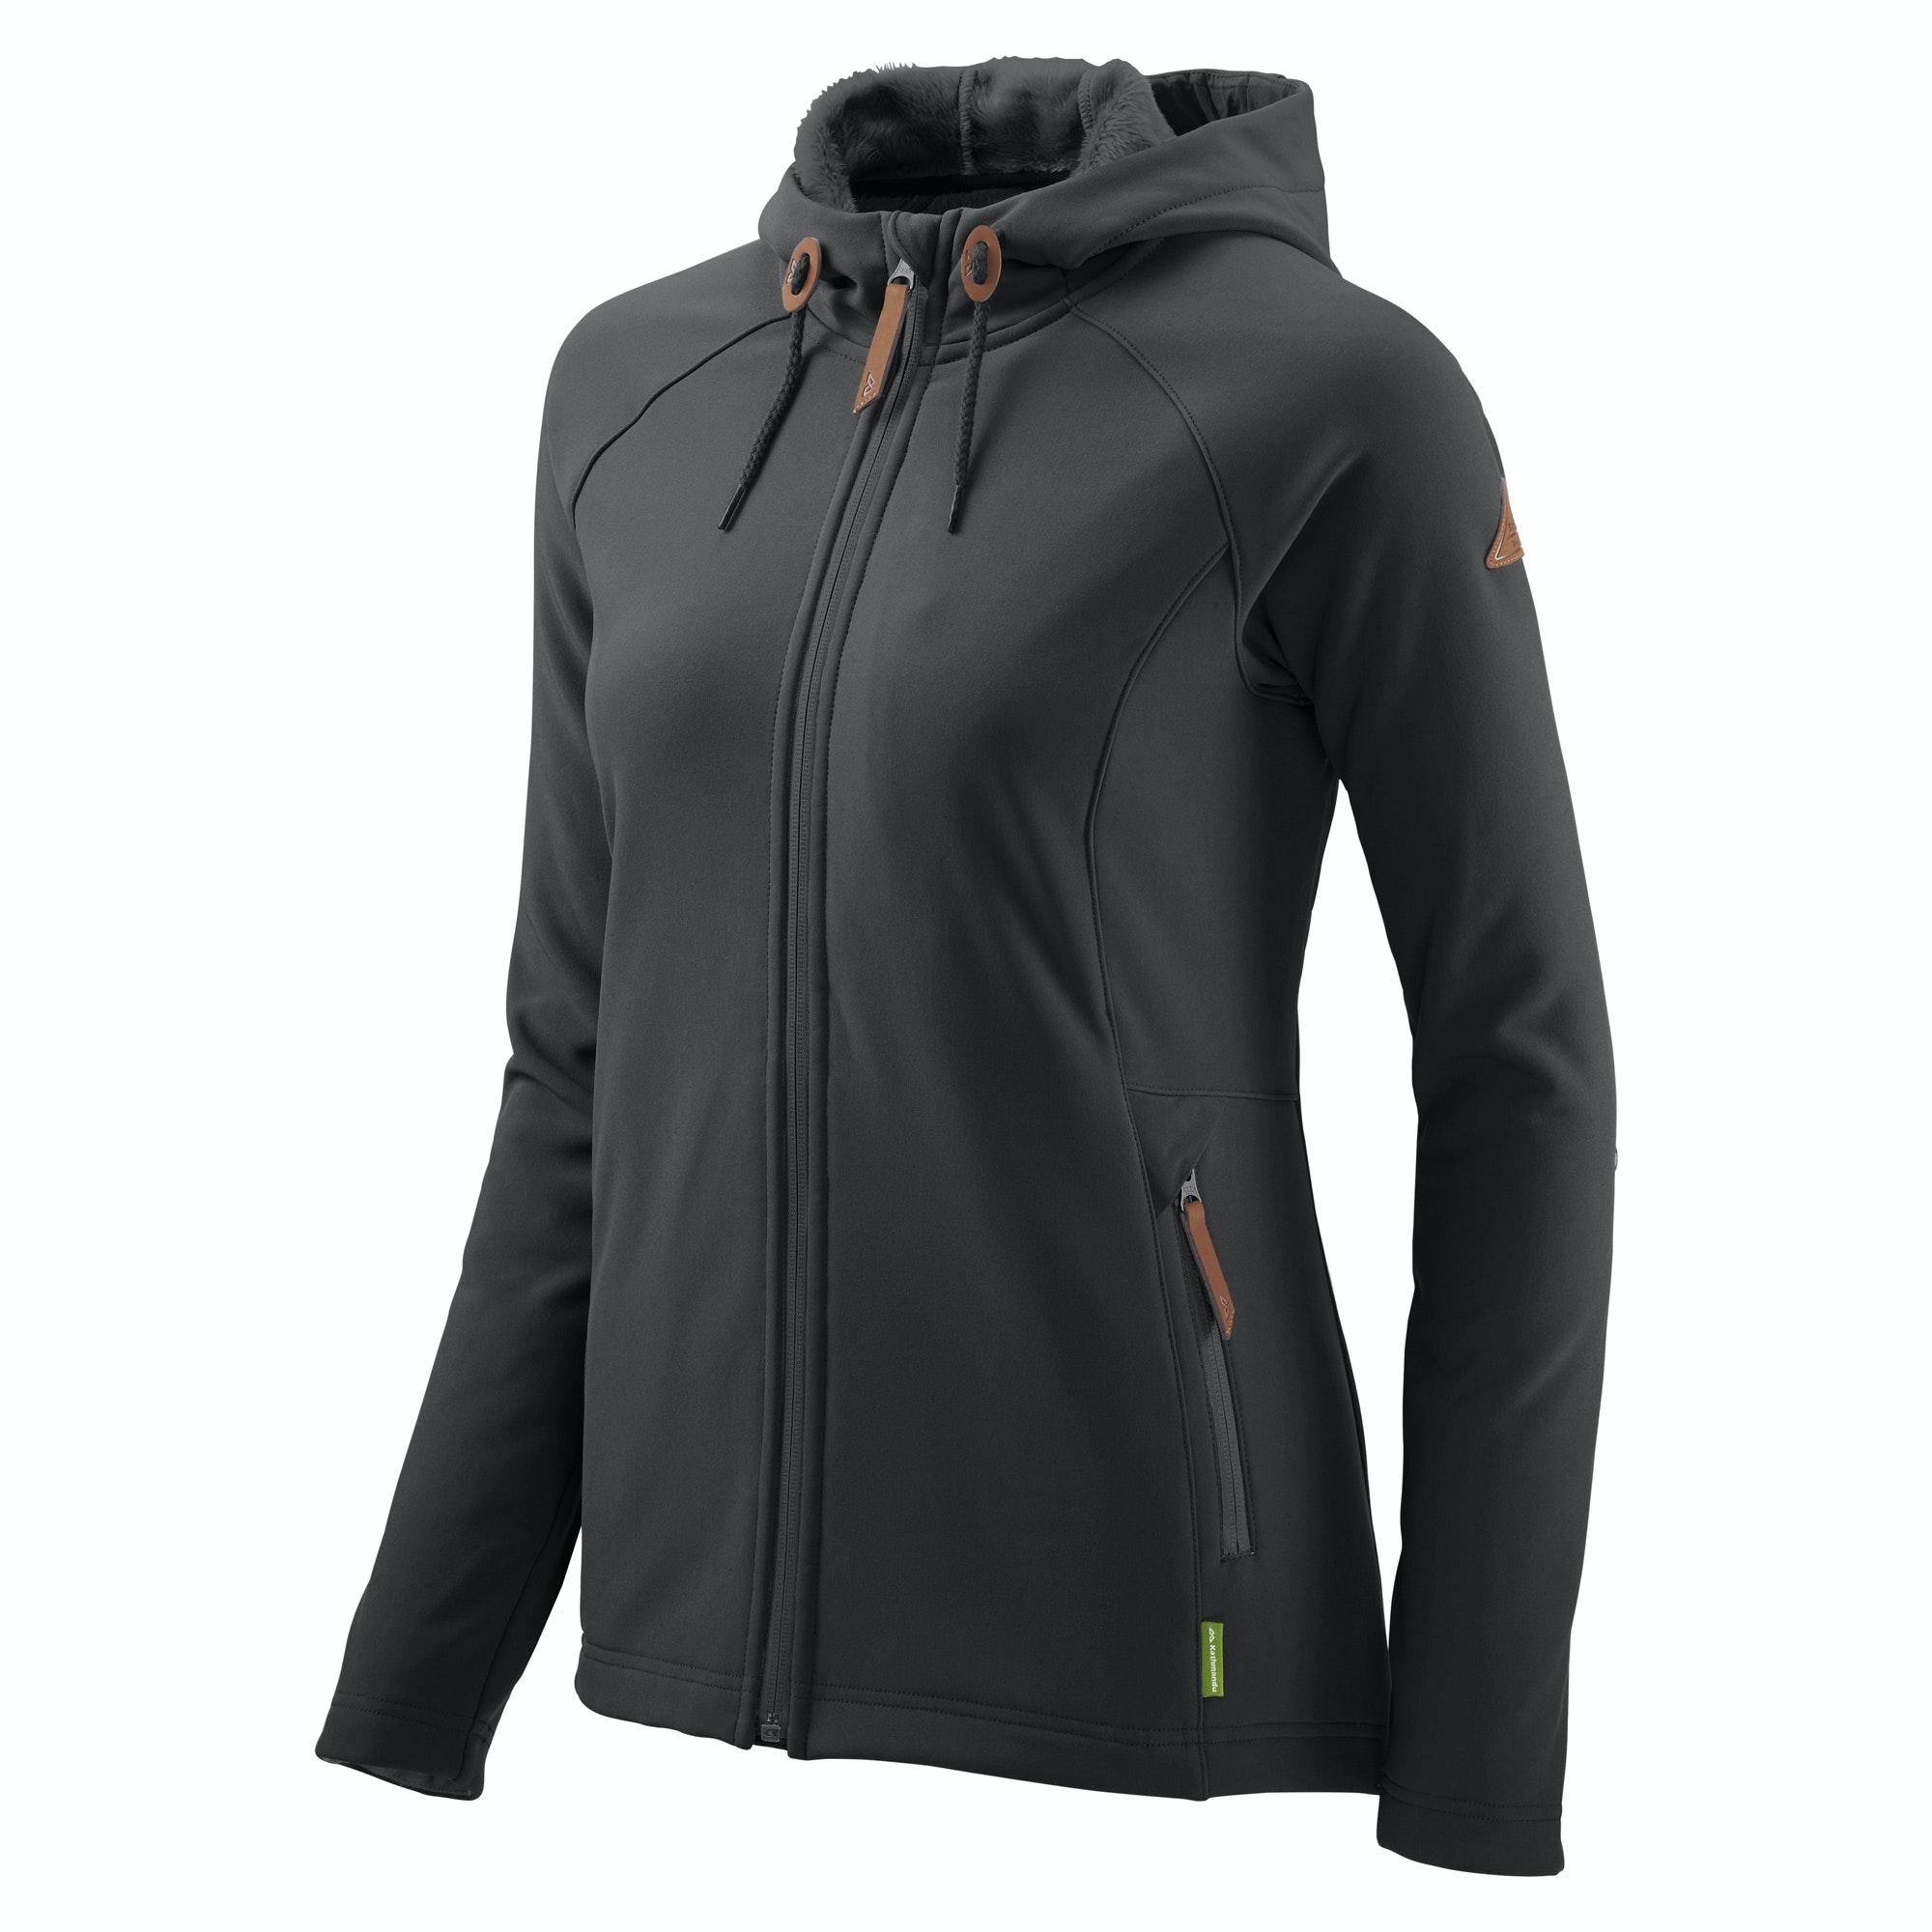 Kathmandu-Malazan-Womens-Hooded-Water-Repellent-Softshell-Fleece-Jacket-Top-v4